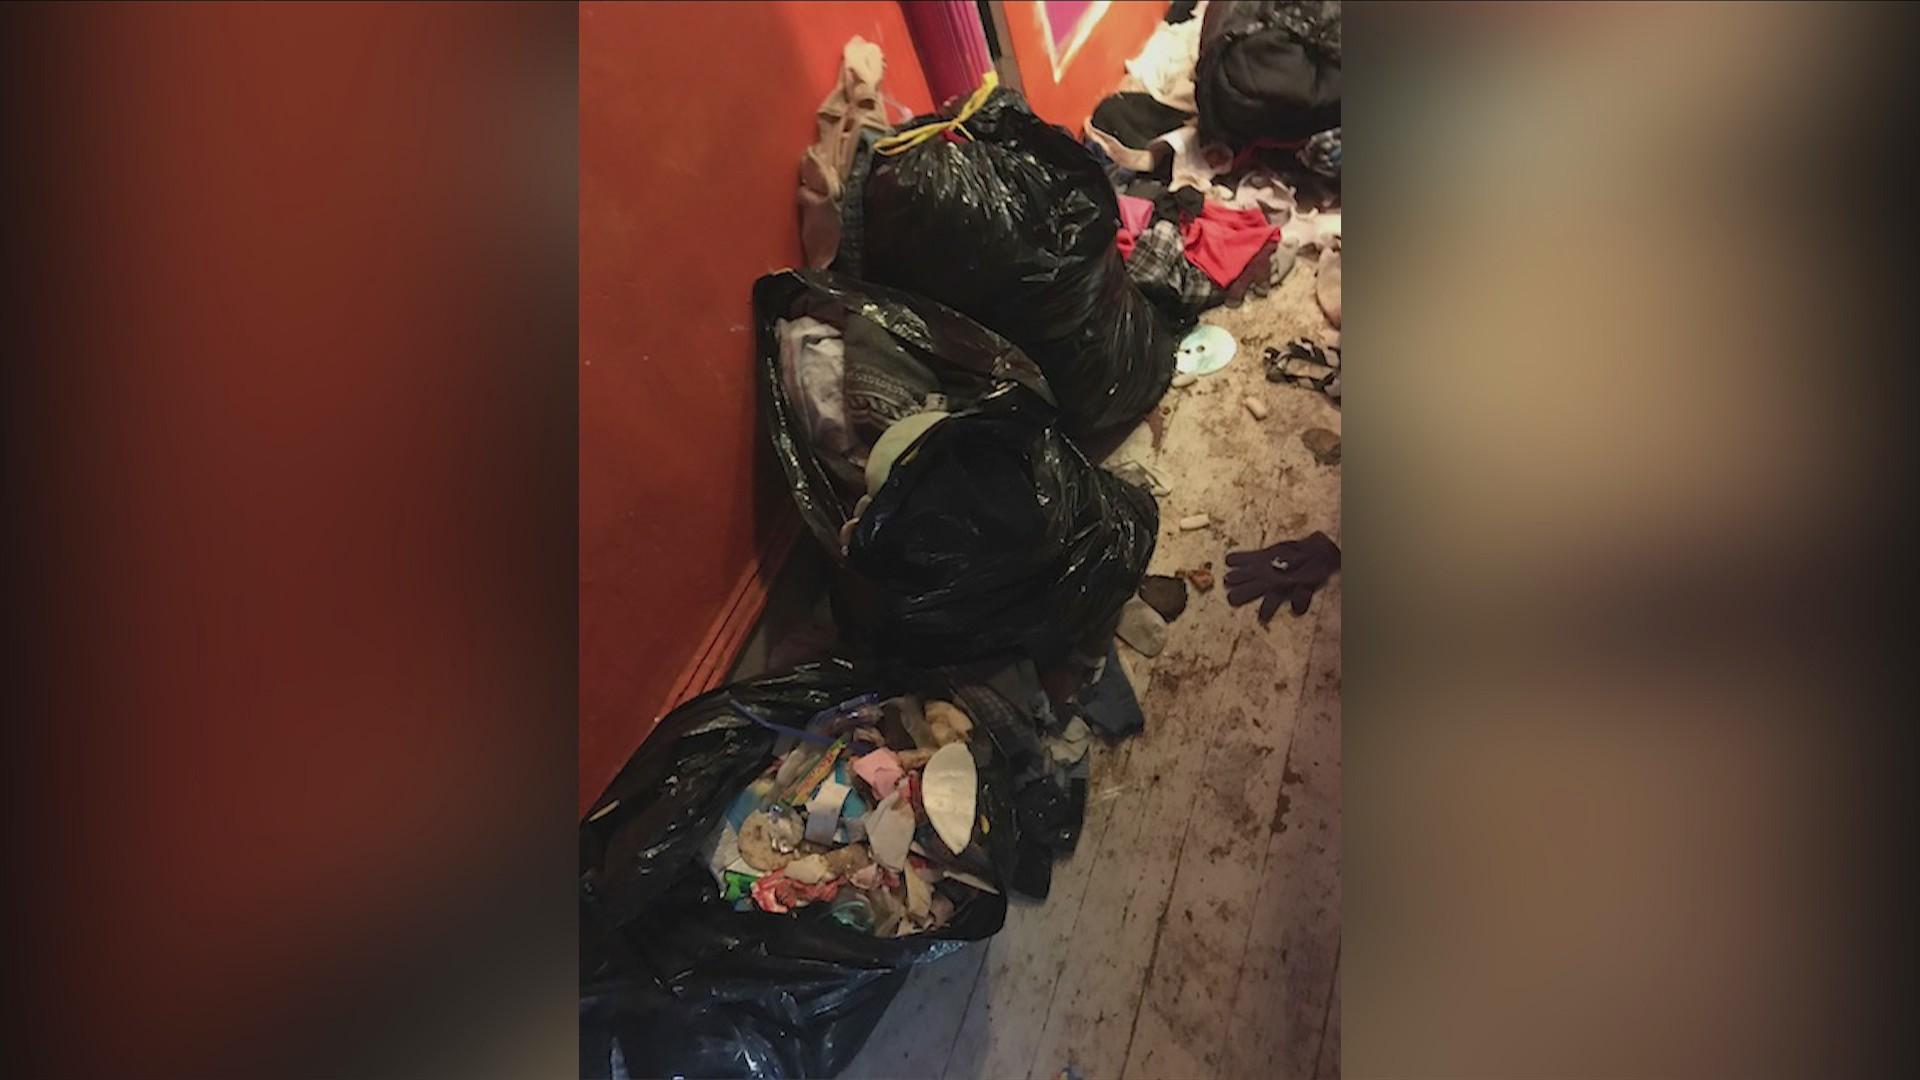 Children Removed from House of Filth in Hazleton